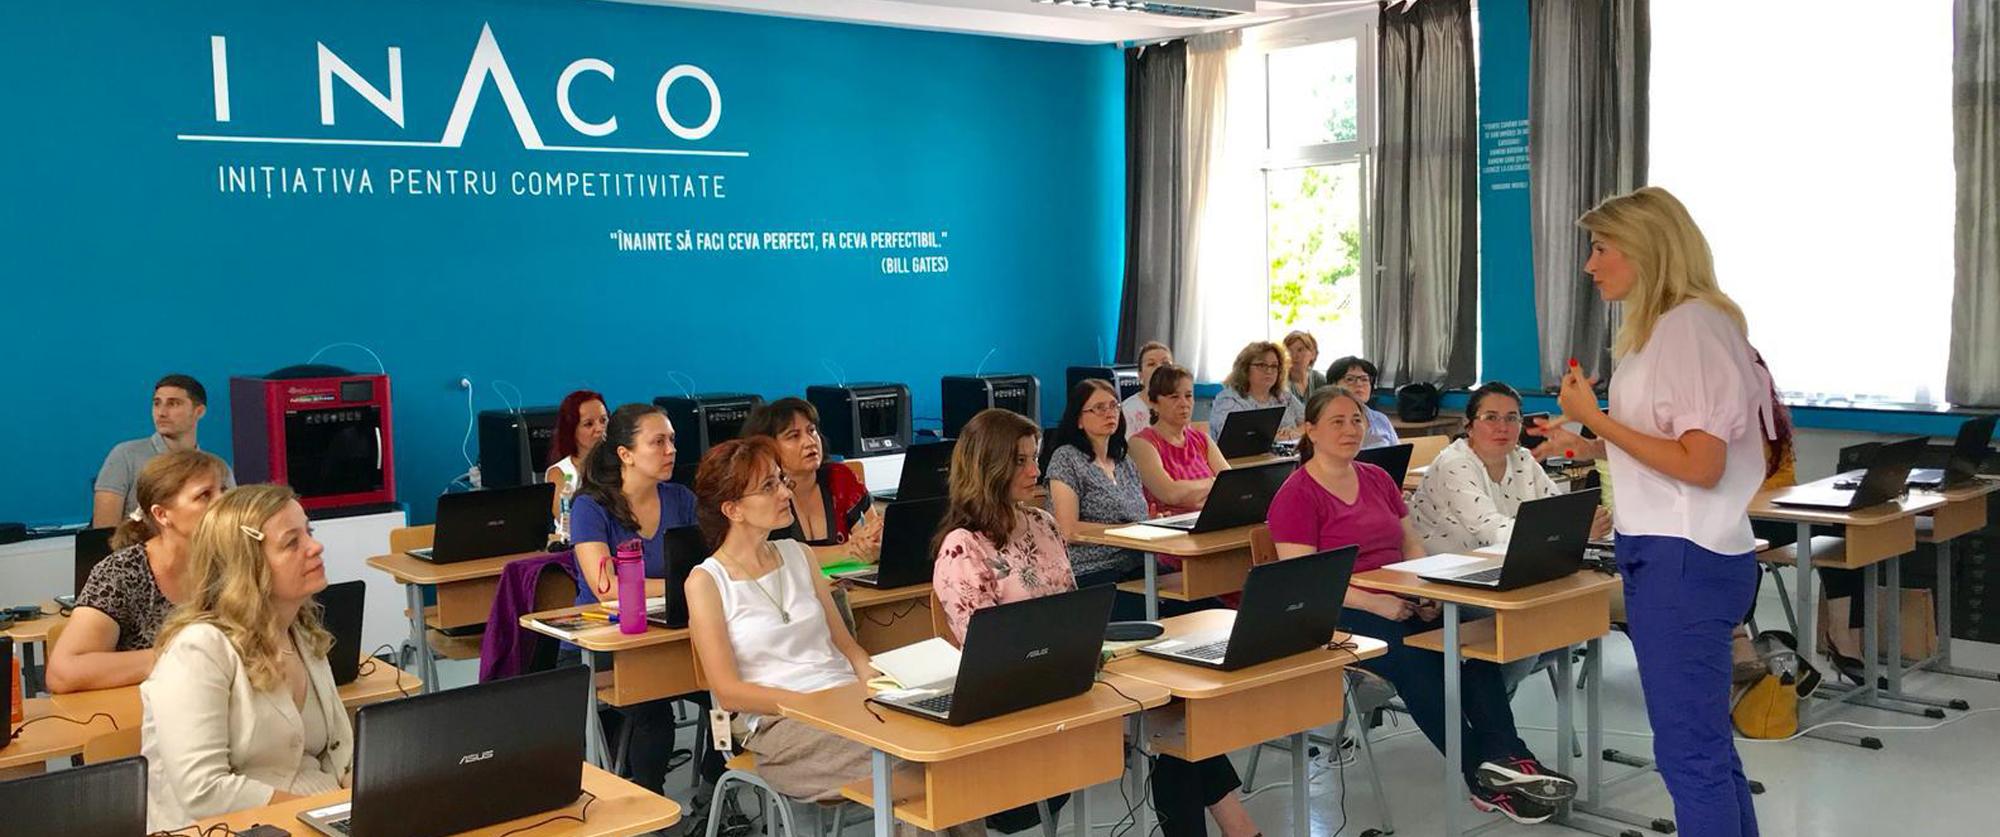 INACO a creat primul laborator inteligent Smart Lab 4.0 din școlile generale românești